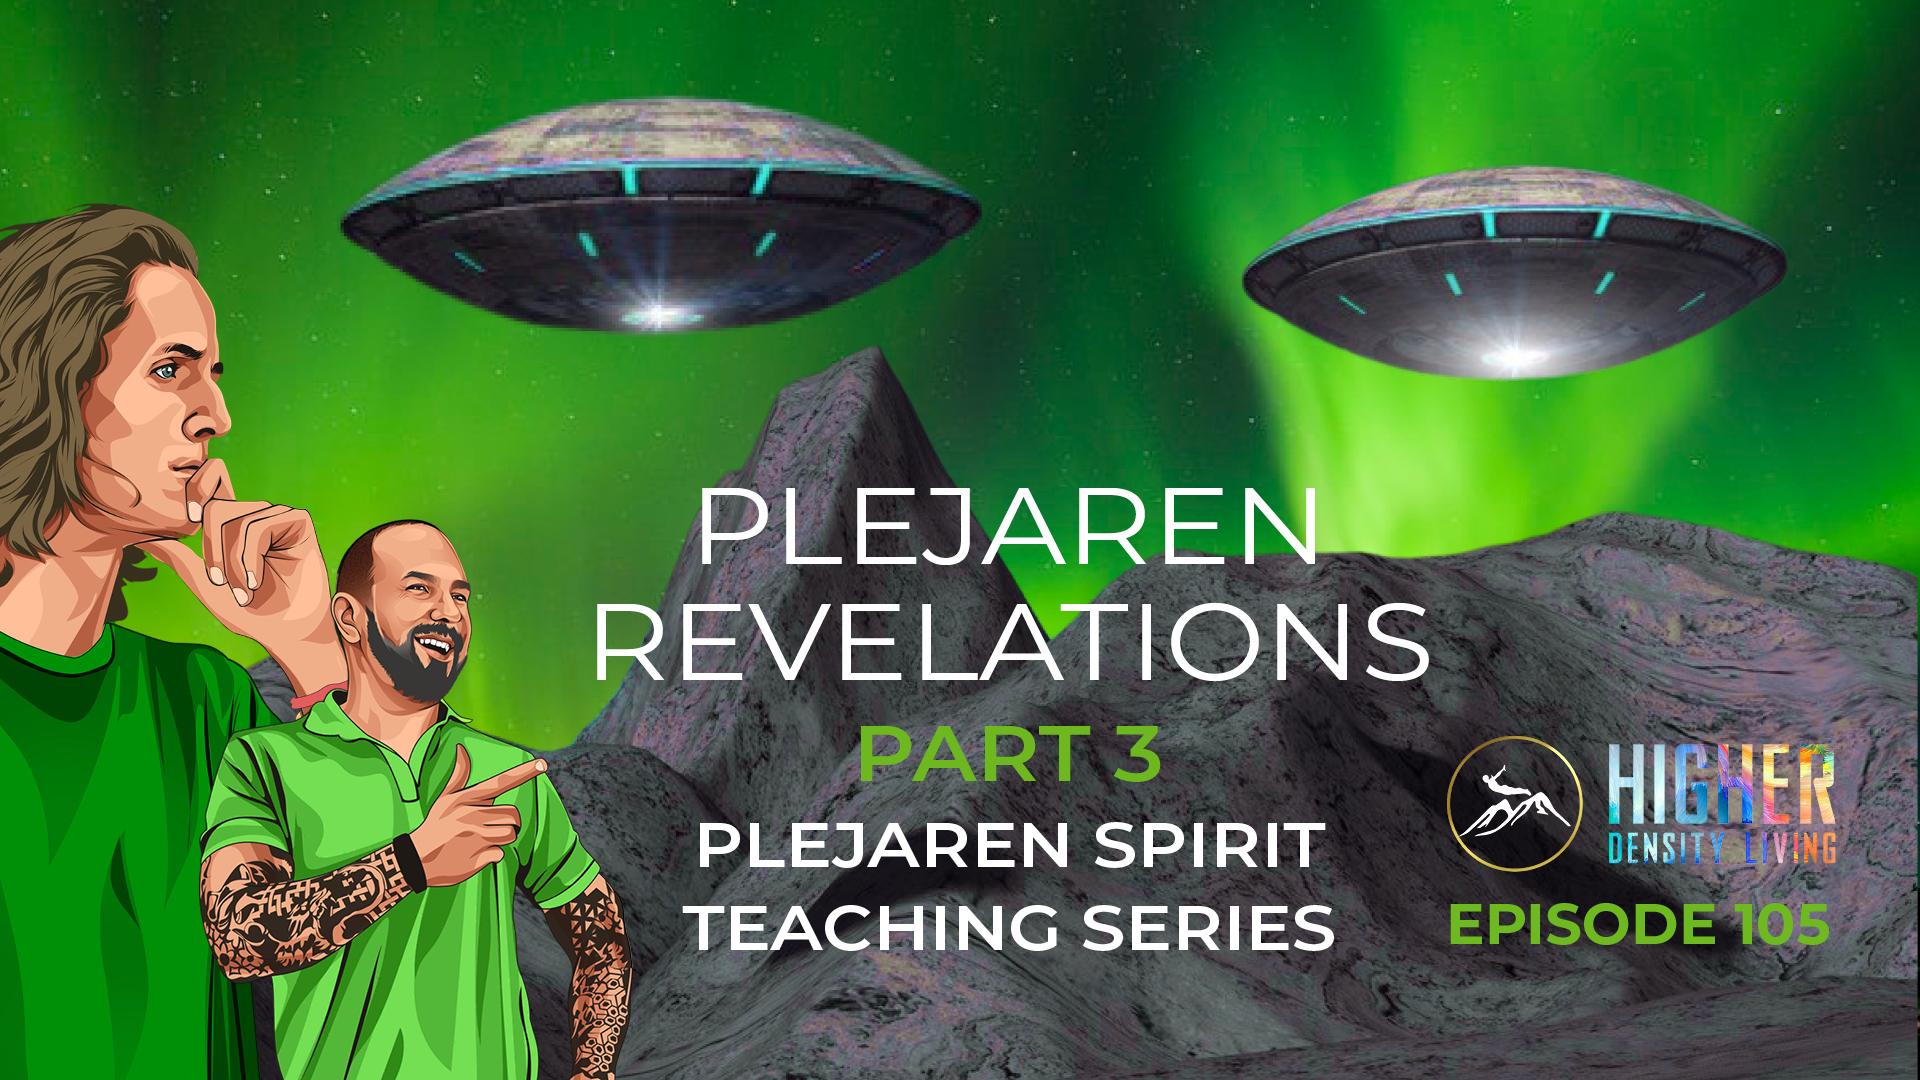 Plejaren Revelations Part 3 - Plejaren Spirit Teaching Series